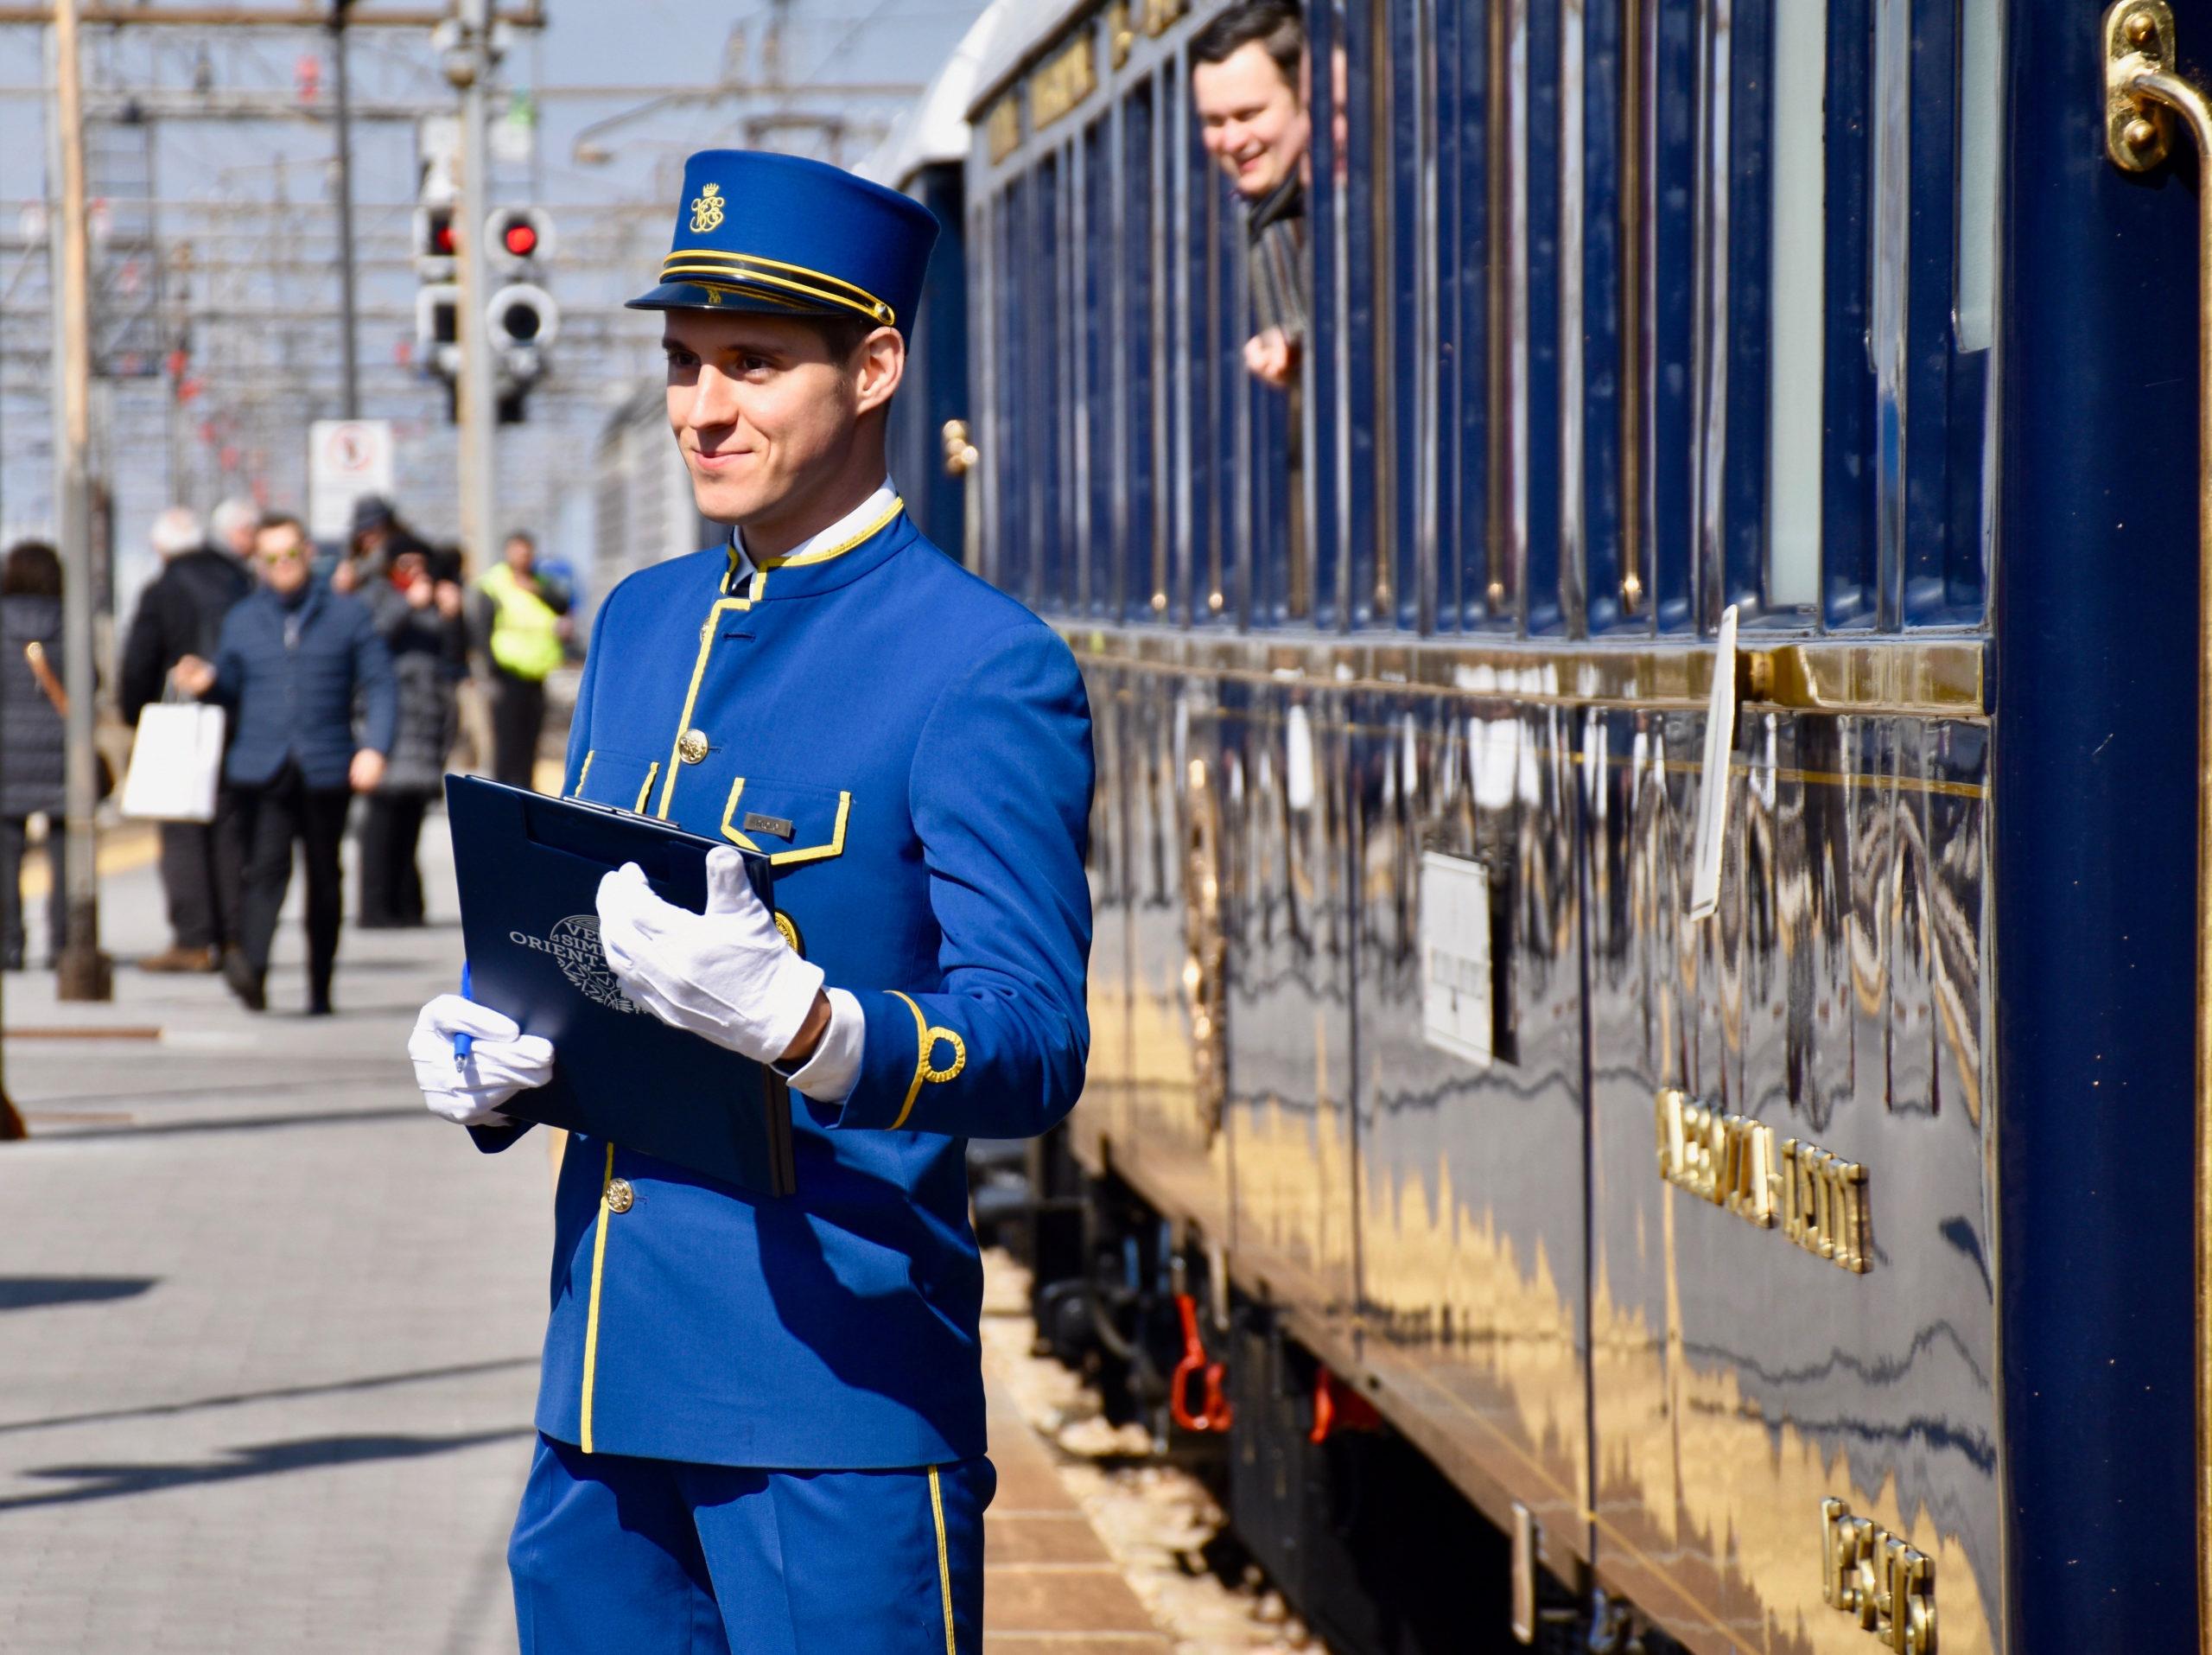 Steward outside train